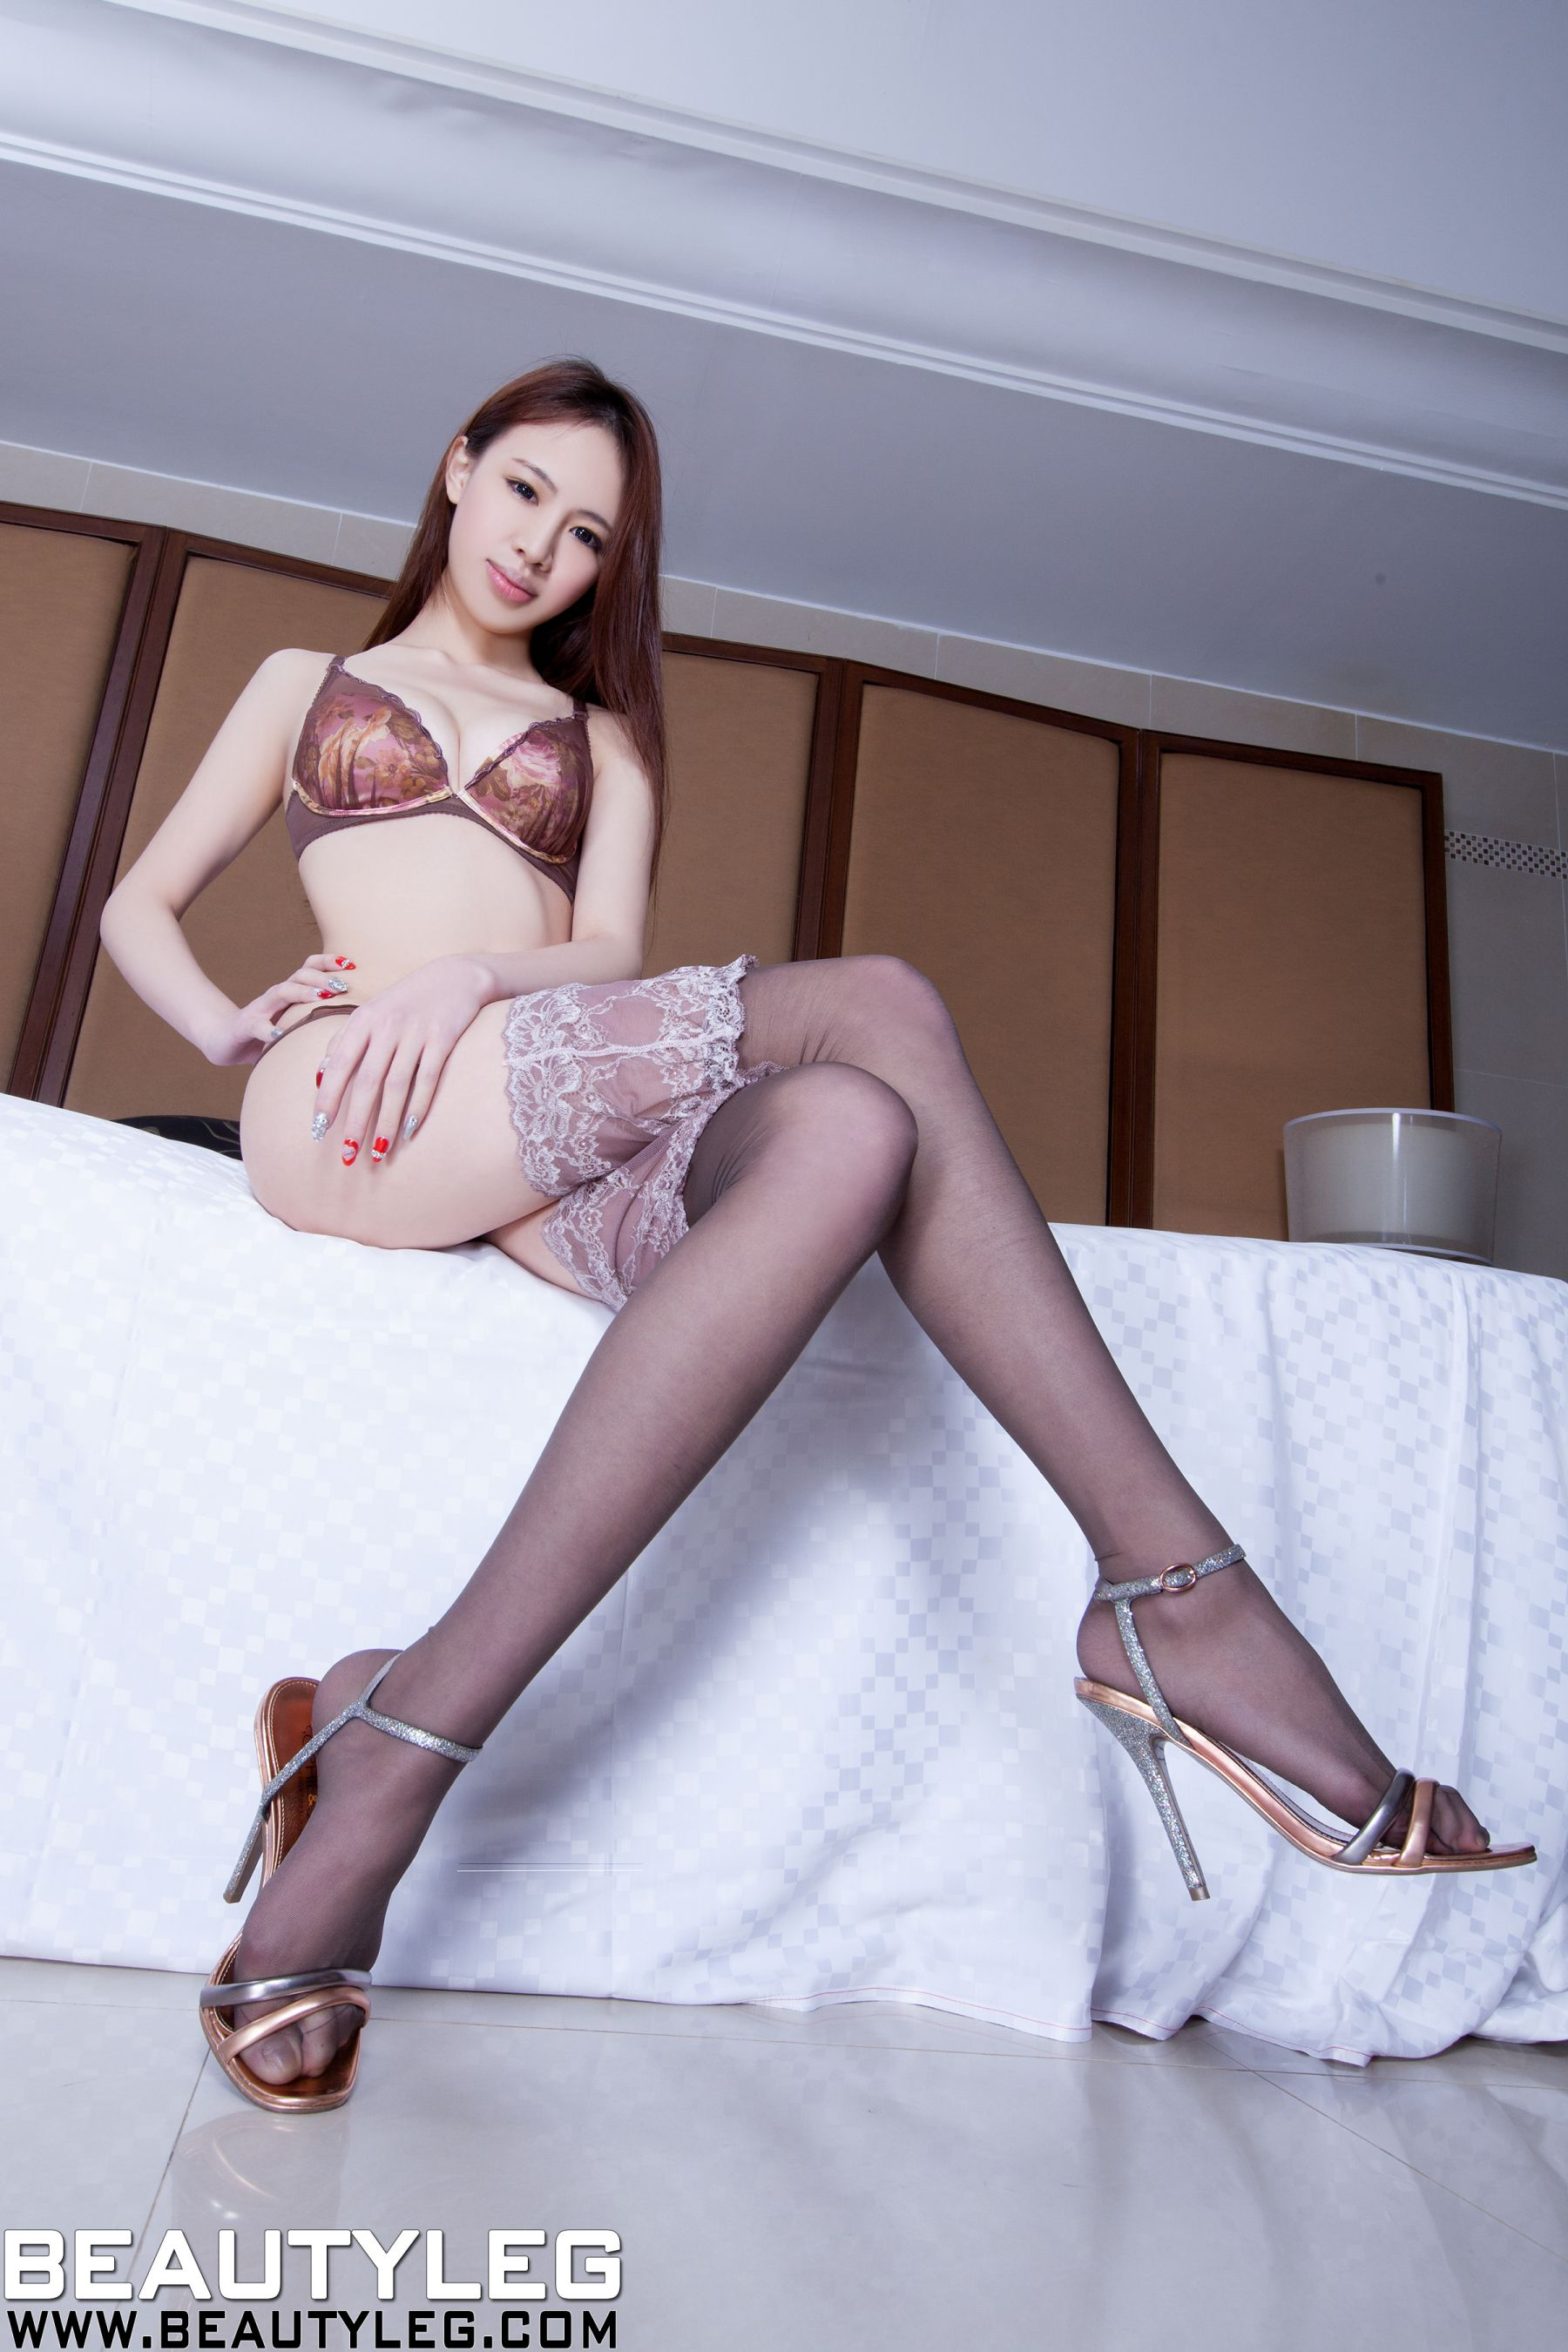 VOL.1117 [Beautyleg]美腿情趣丝袜长腿美女:腿模Cindy(Cindy)高品质写真套图(55P)